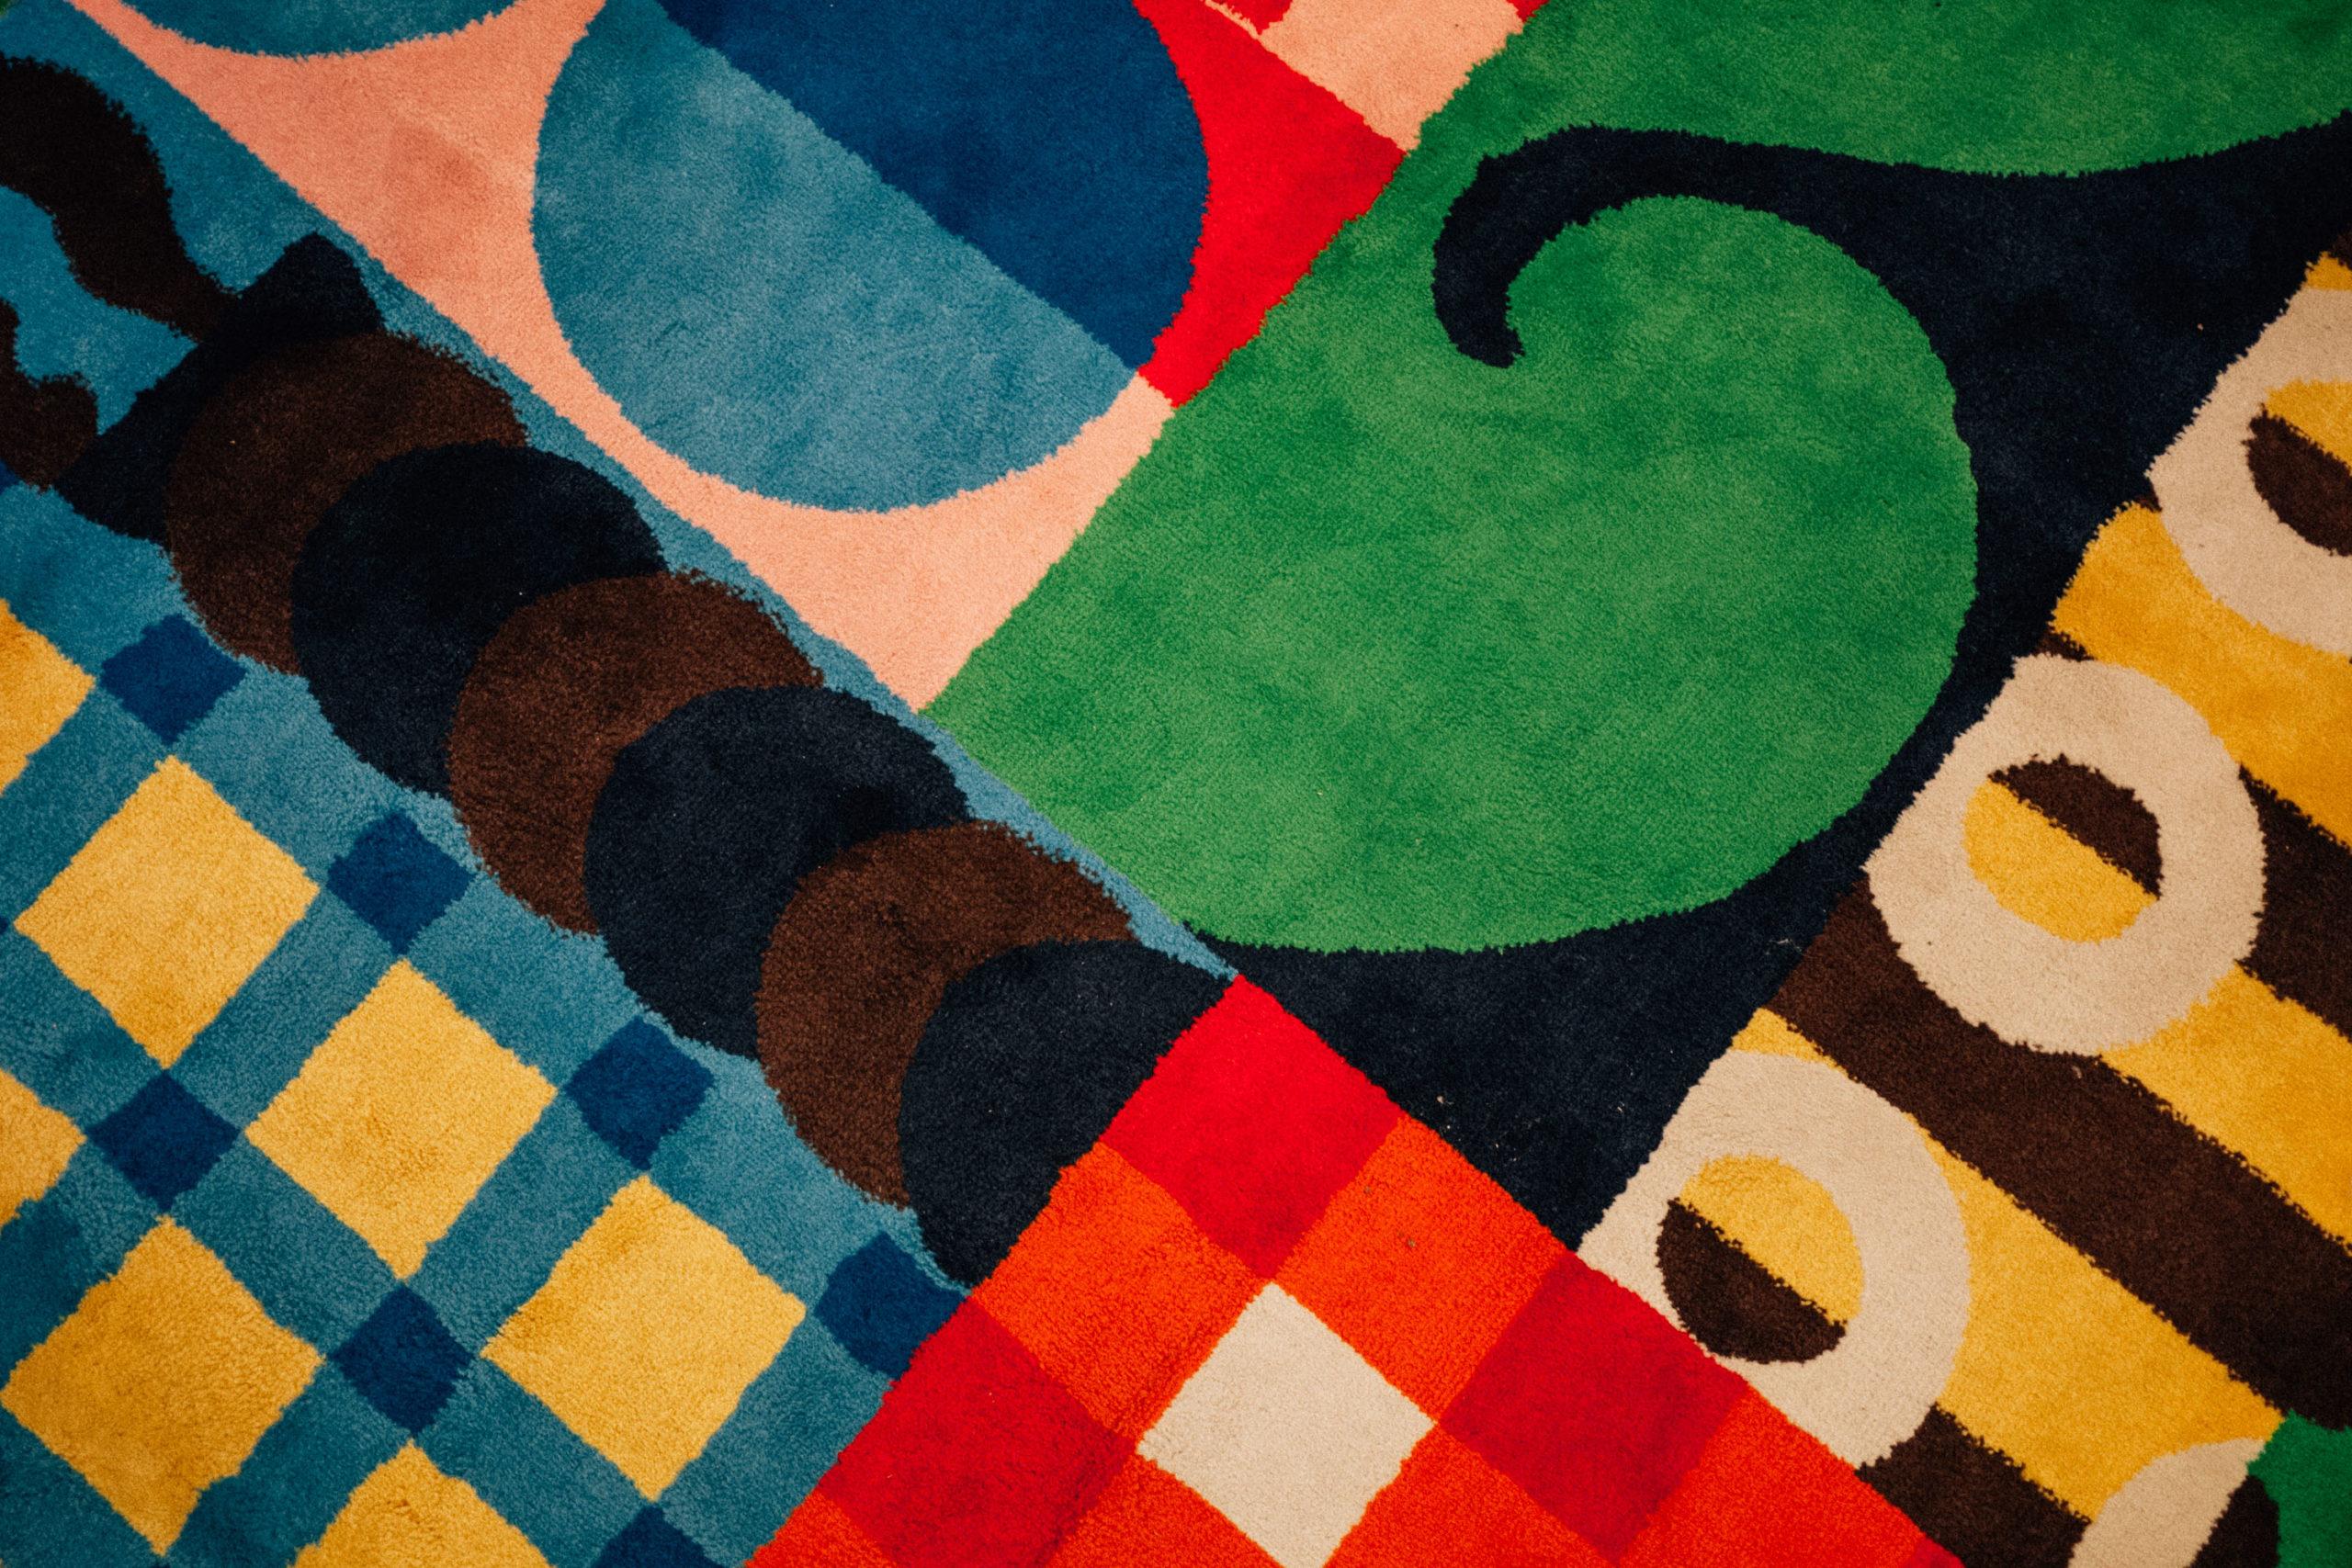 Colorful geometric IKEA rug